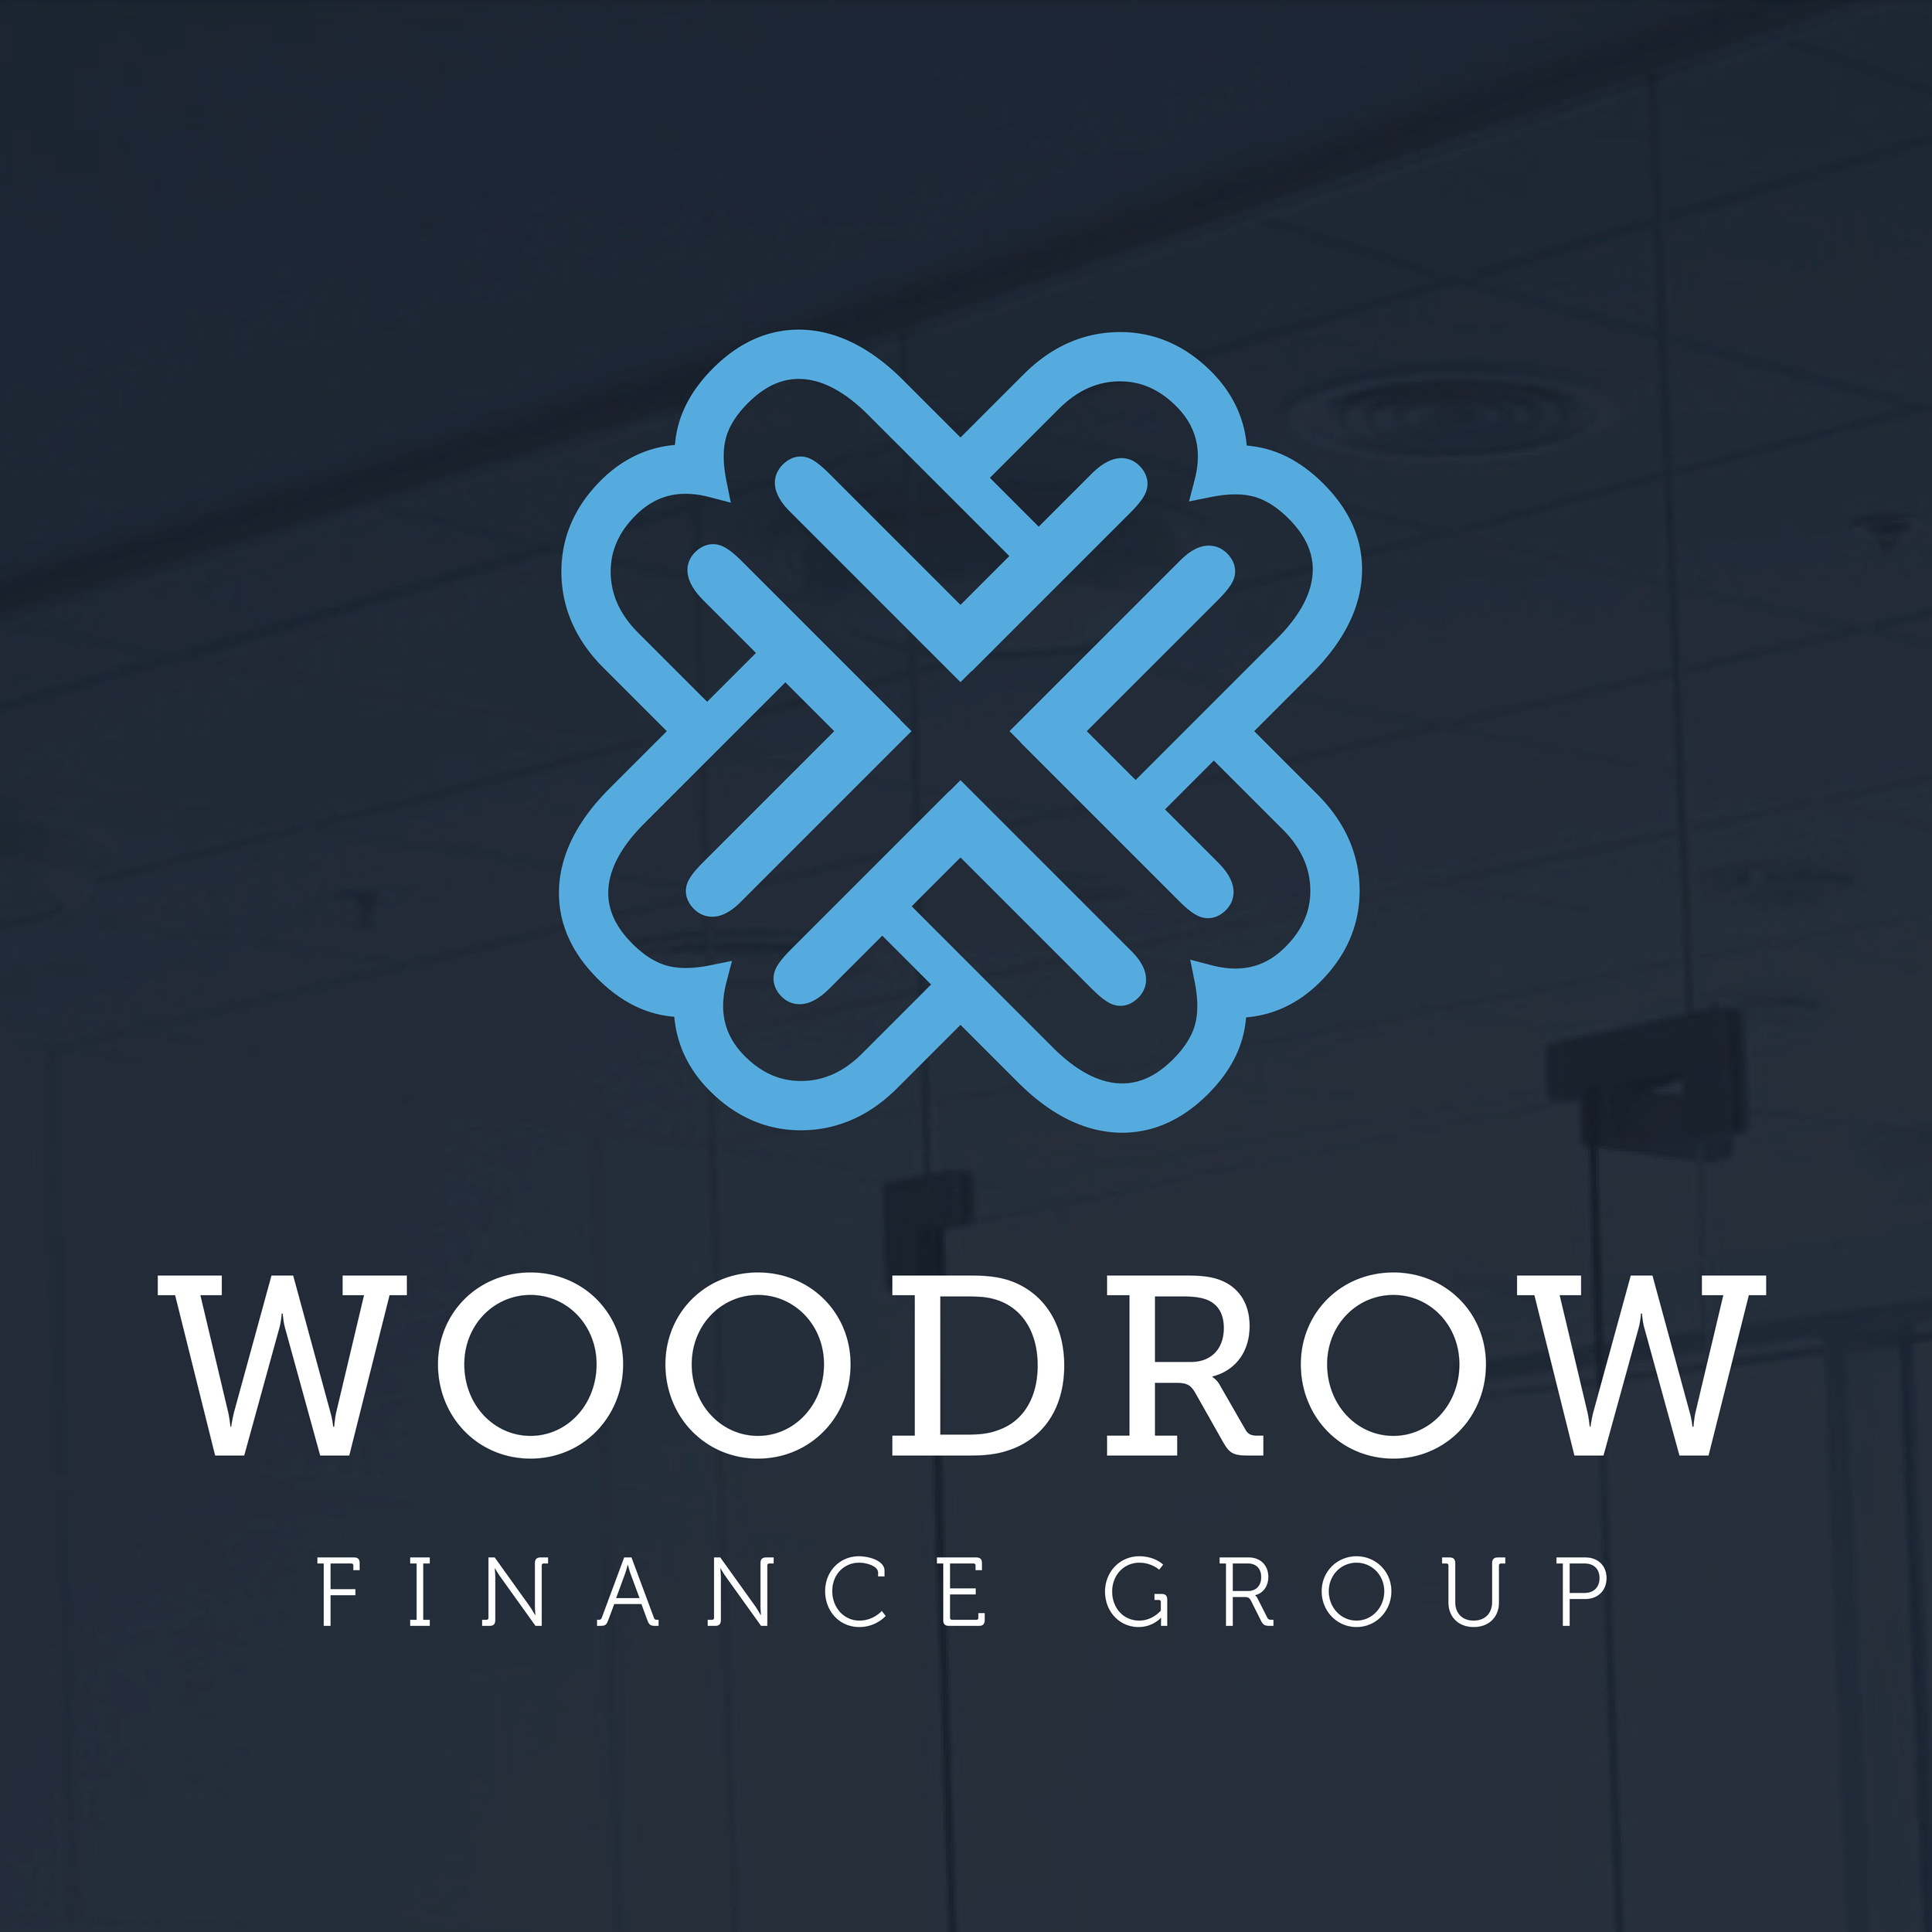 Woodrow_Fb_profile.png